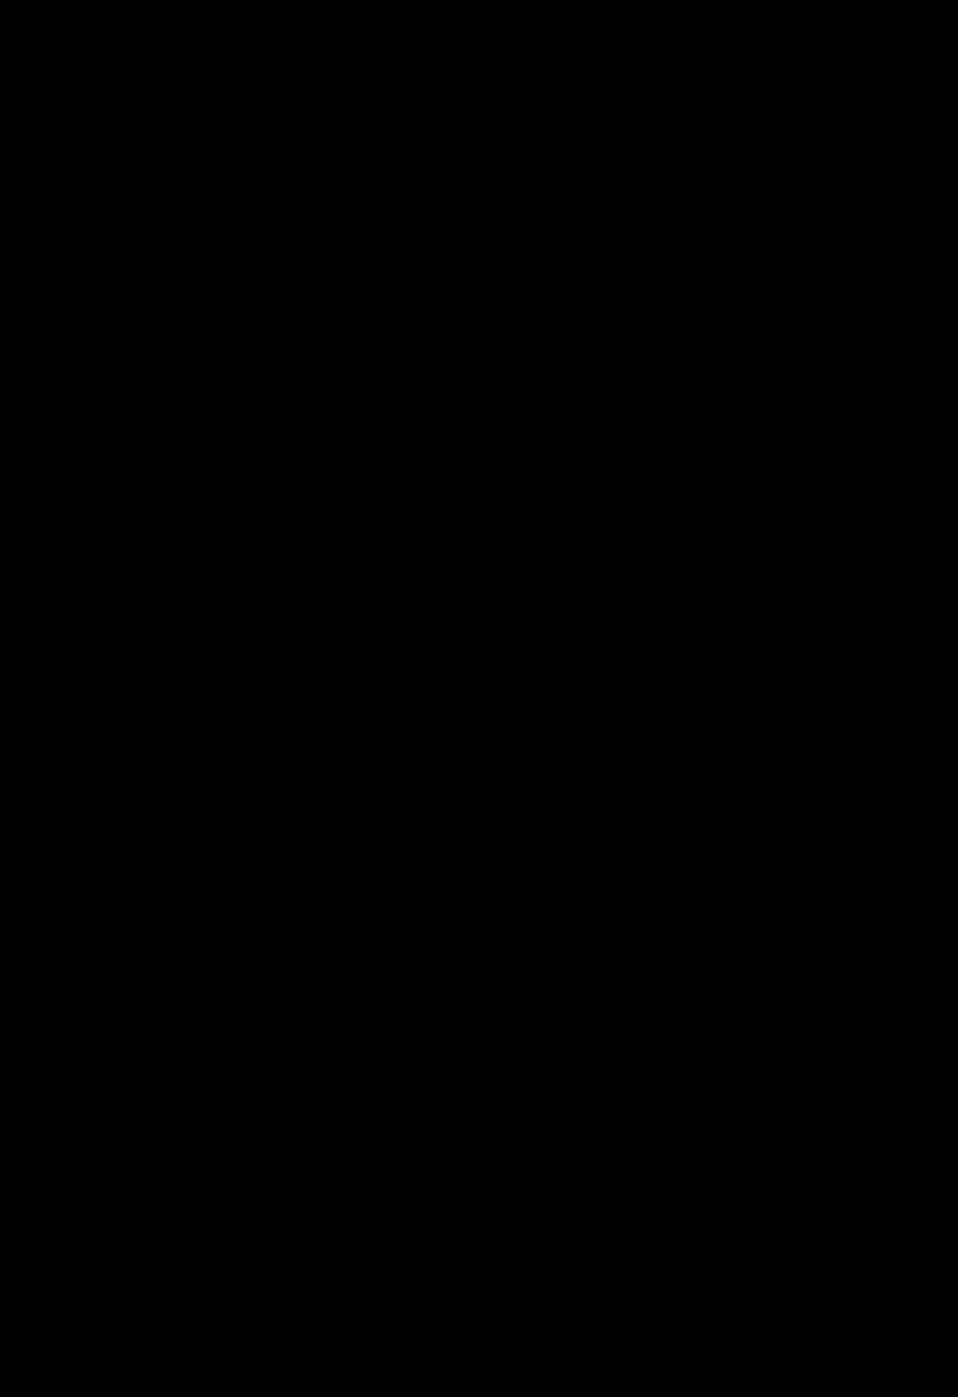 Black and white . Barrel clipart transparent background